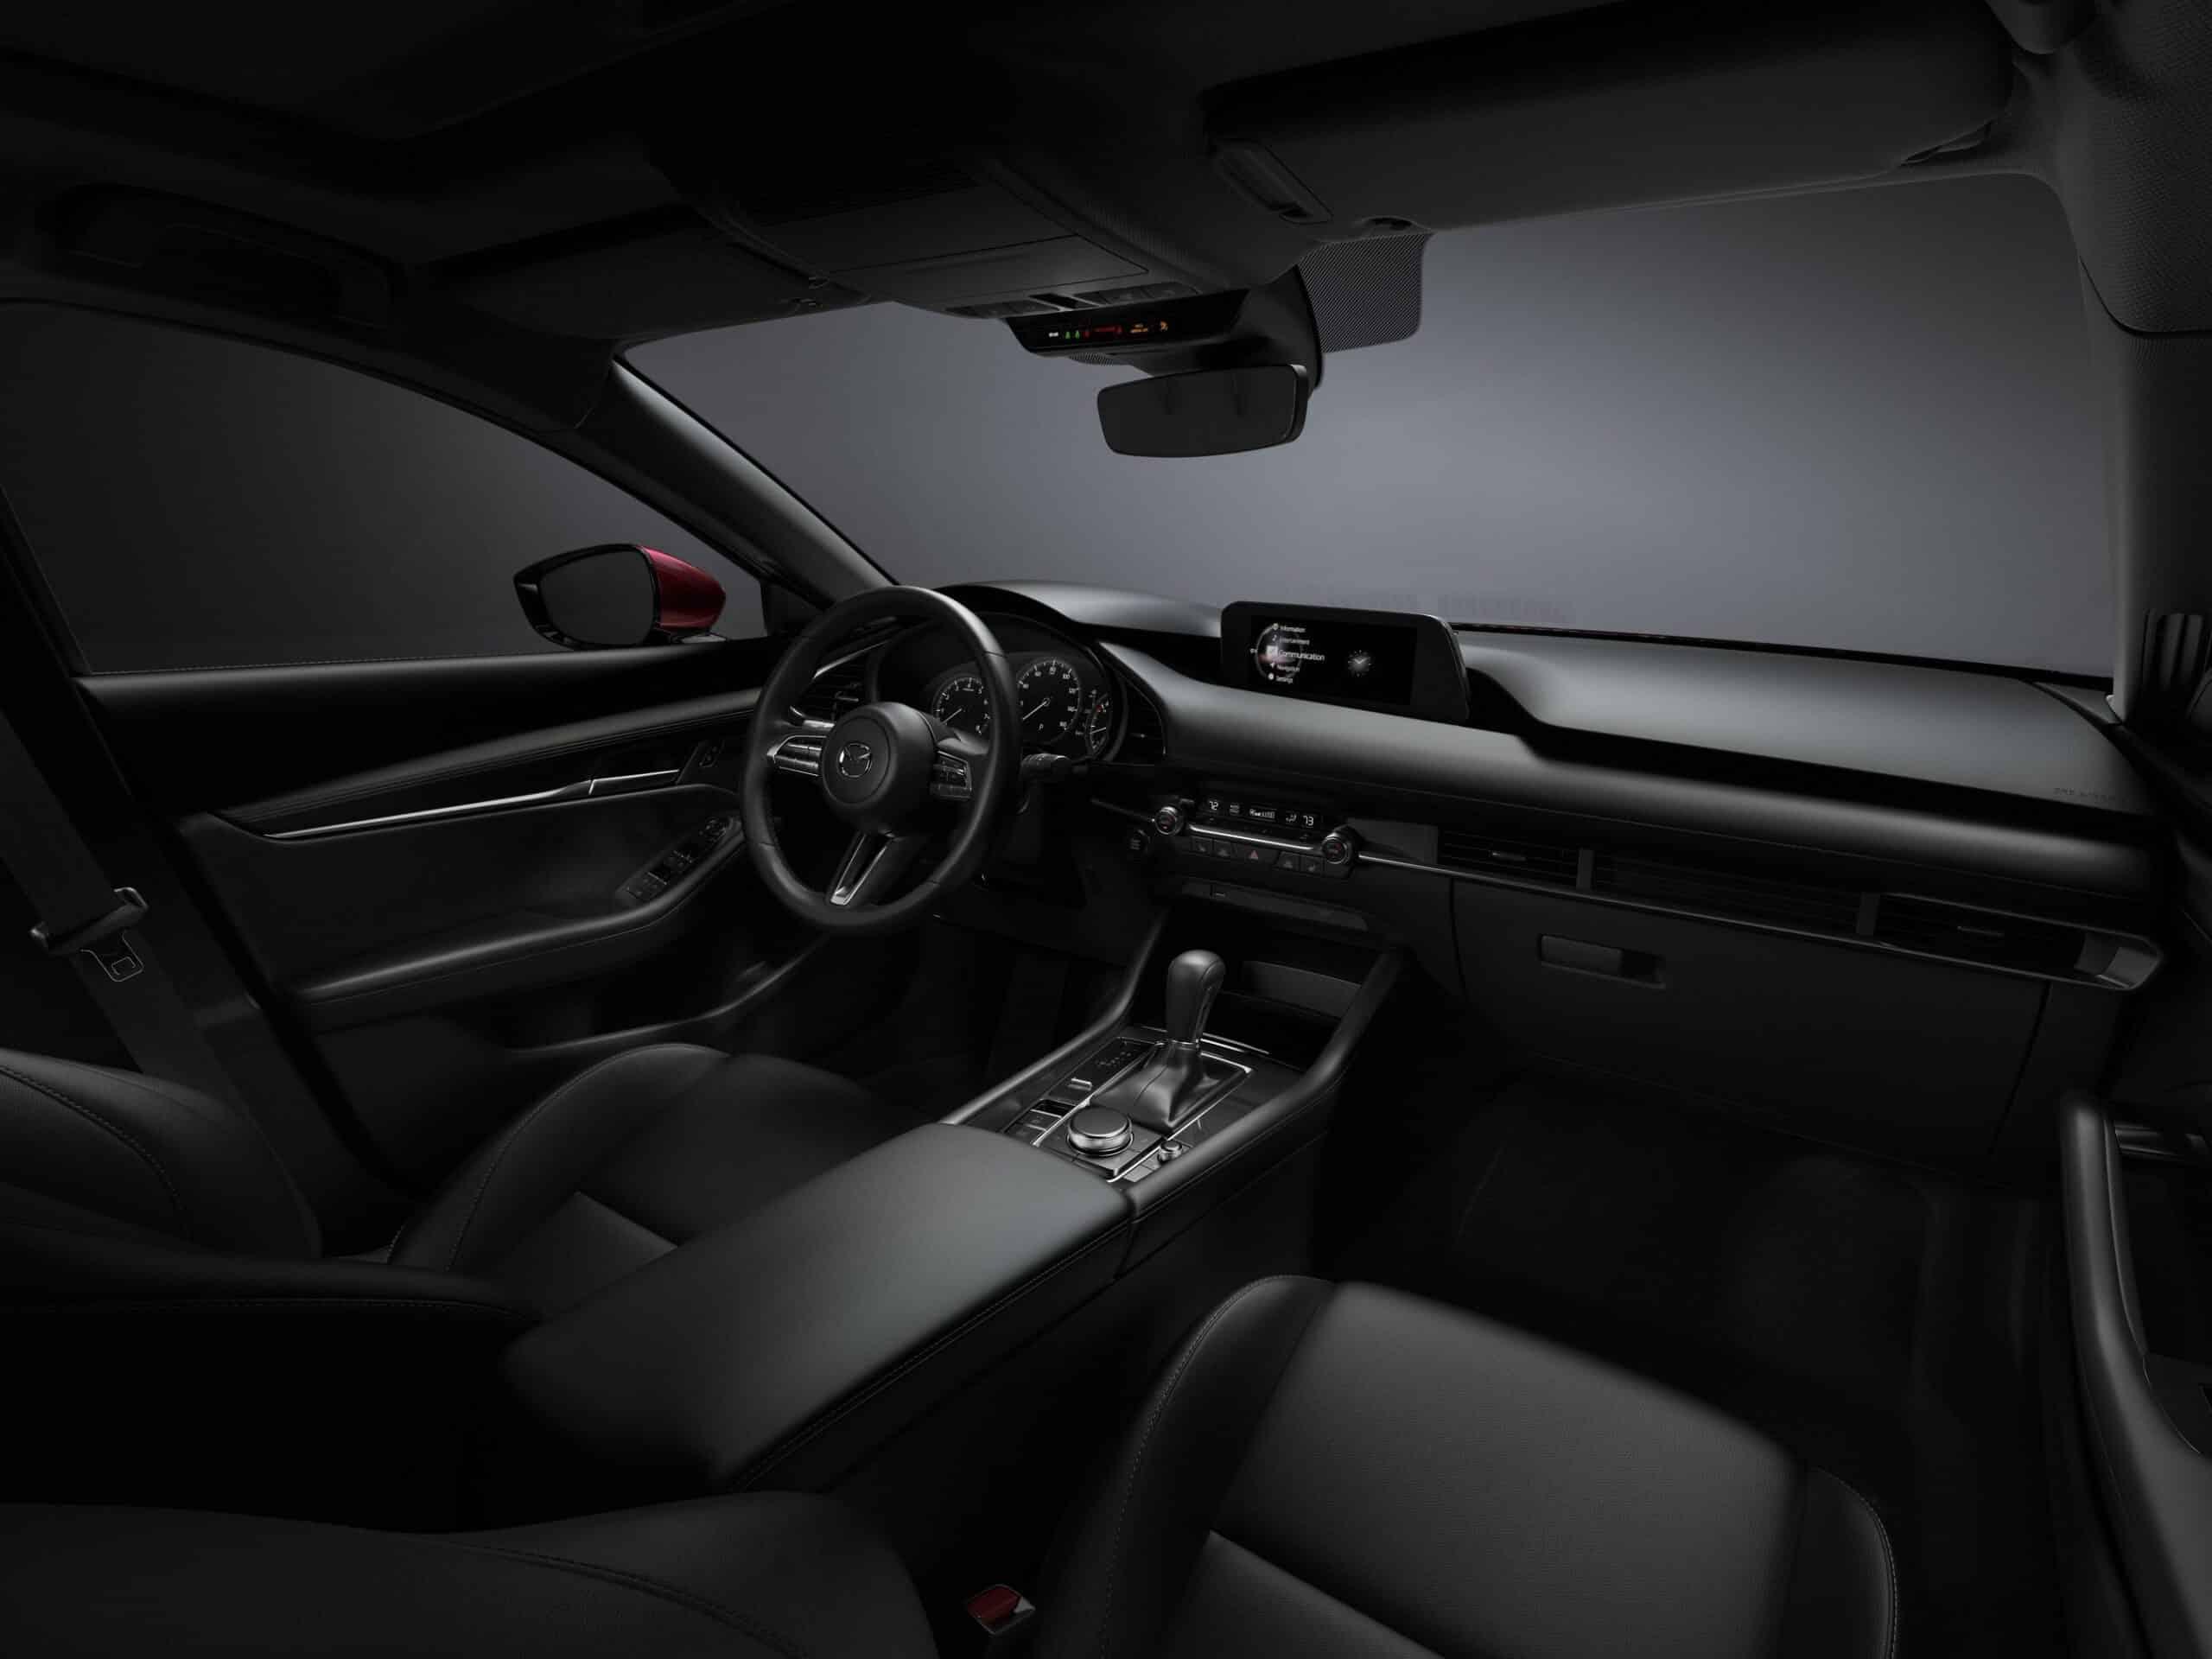 Intérieur de la Mazda3 2020